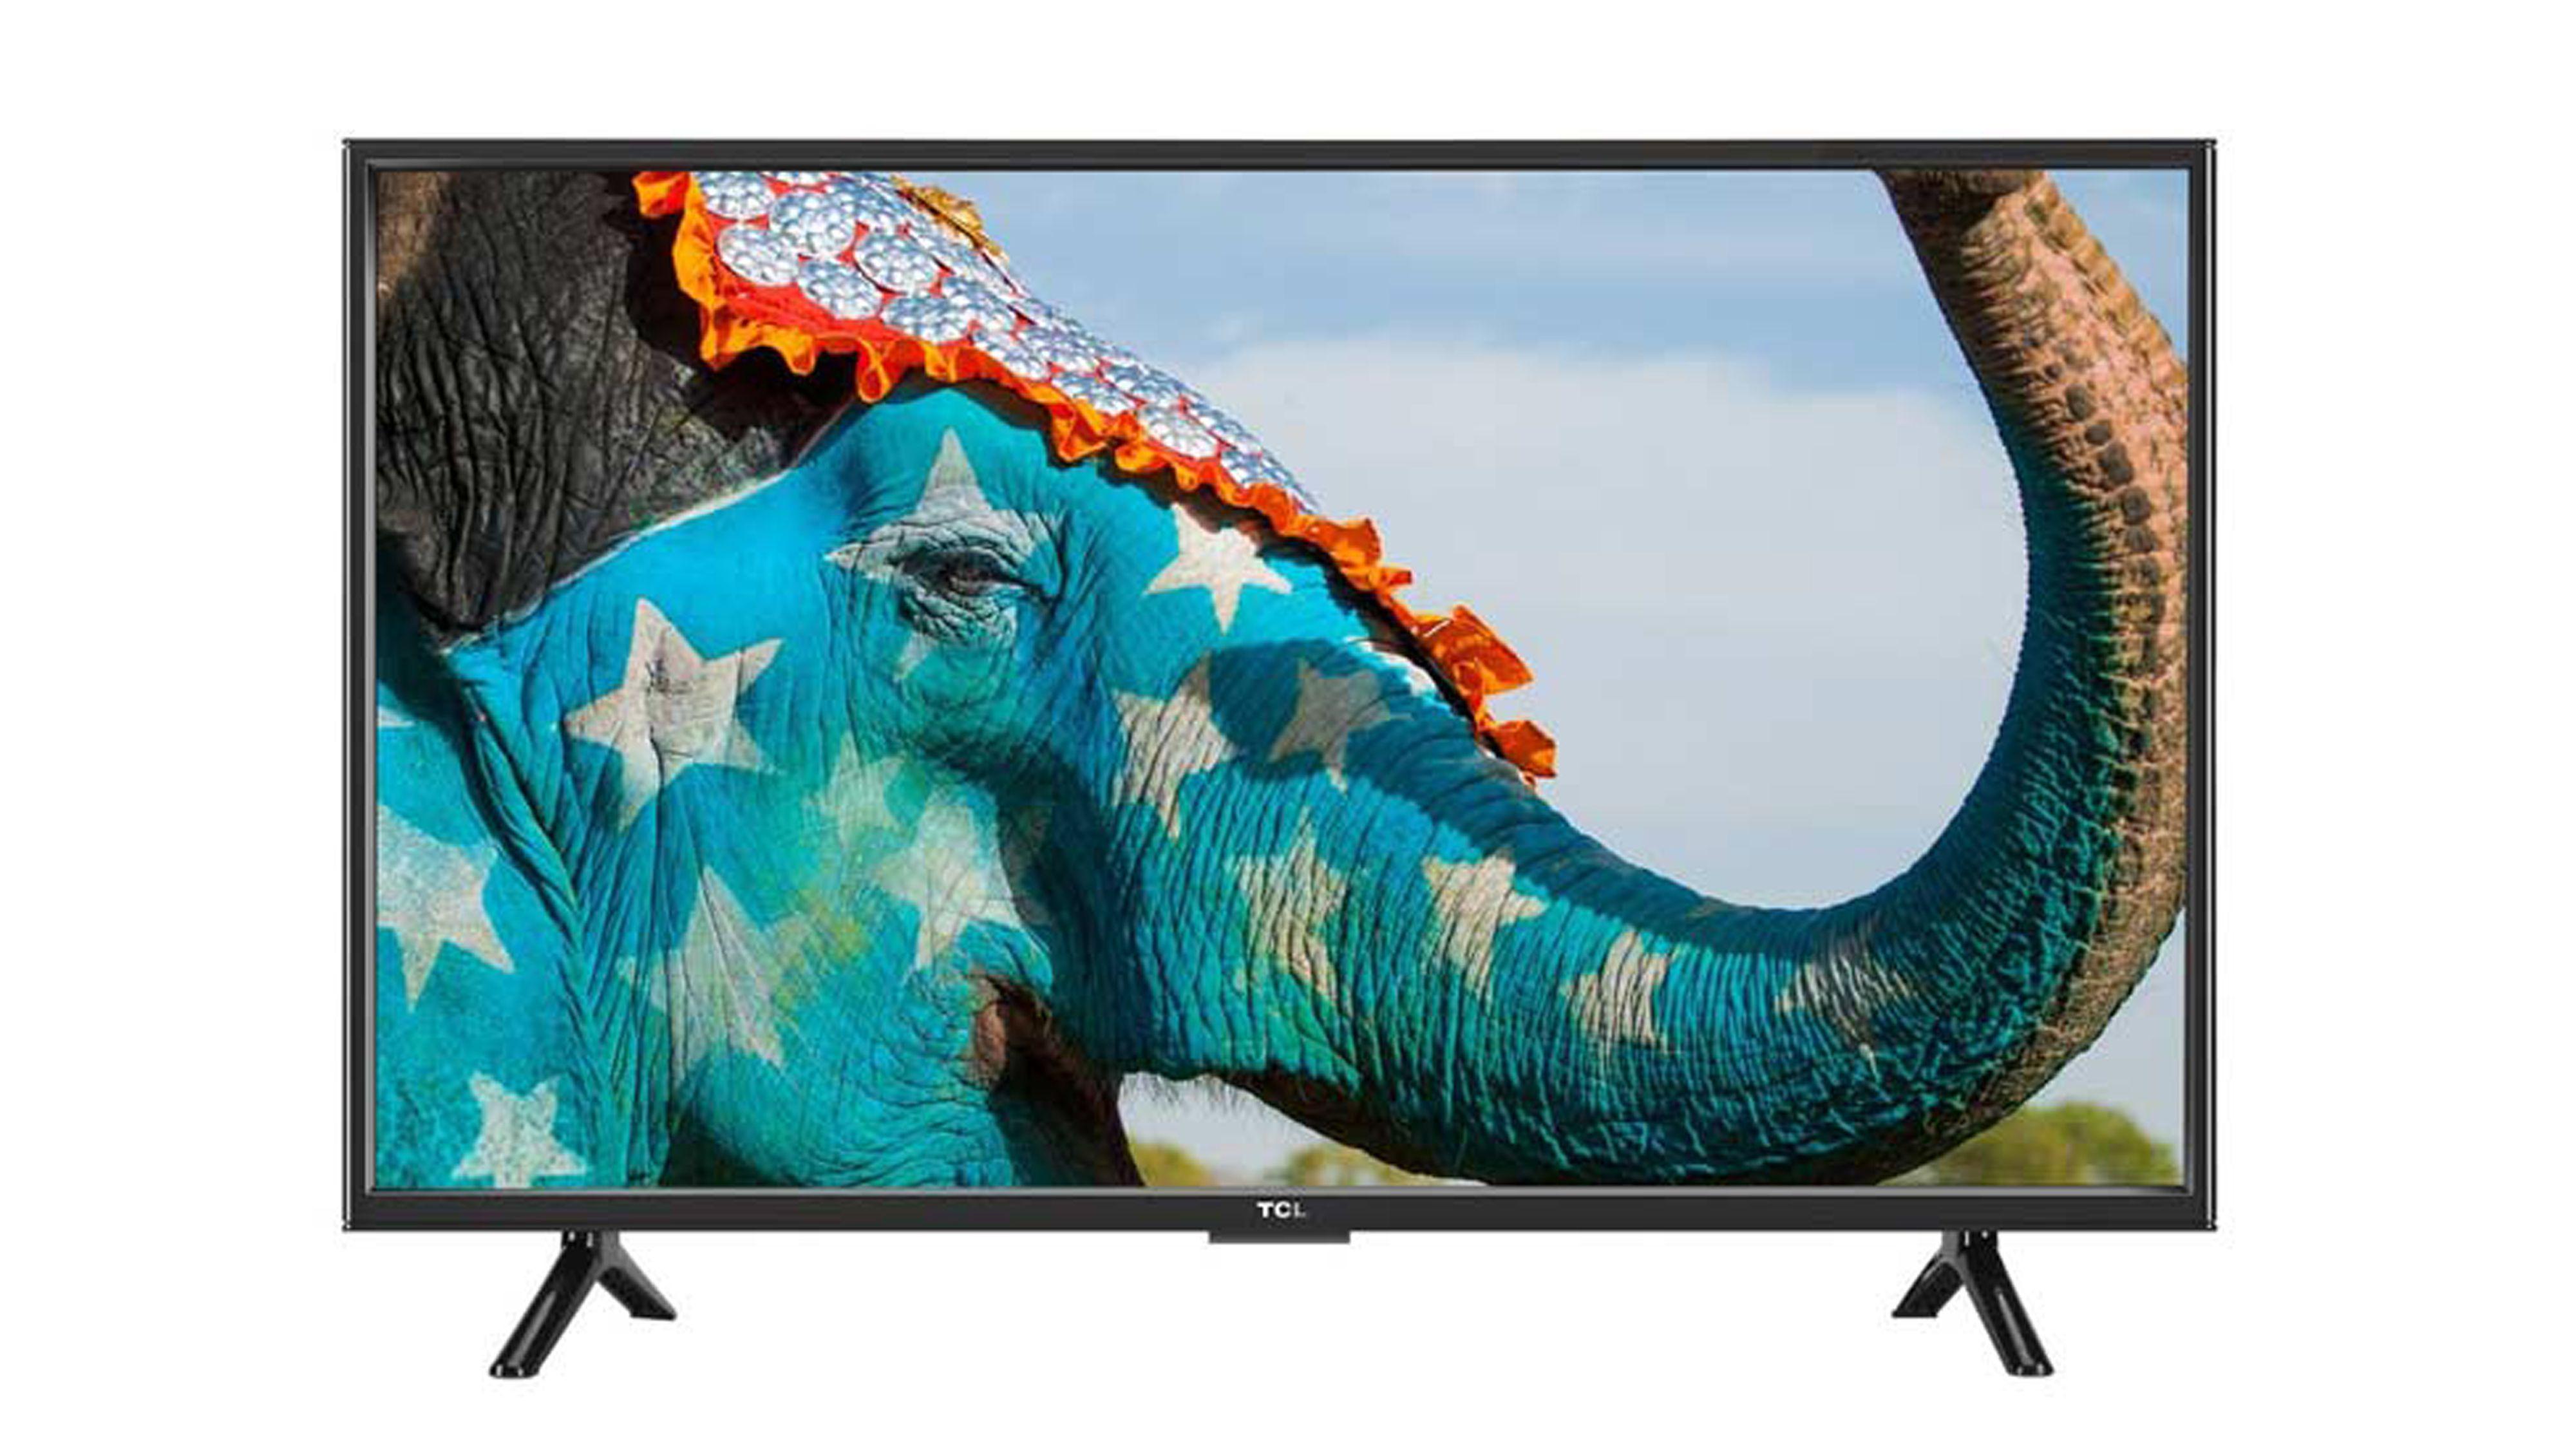 TCL L32F3900 81 cm 32 HD Ready HDR LED Television